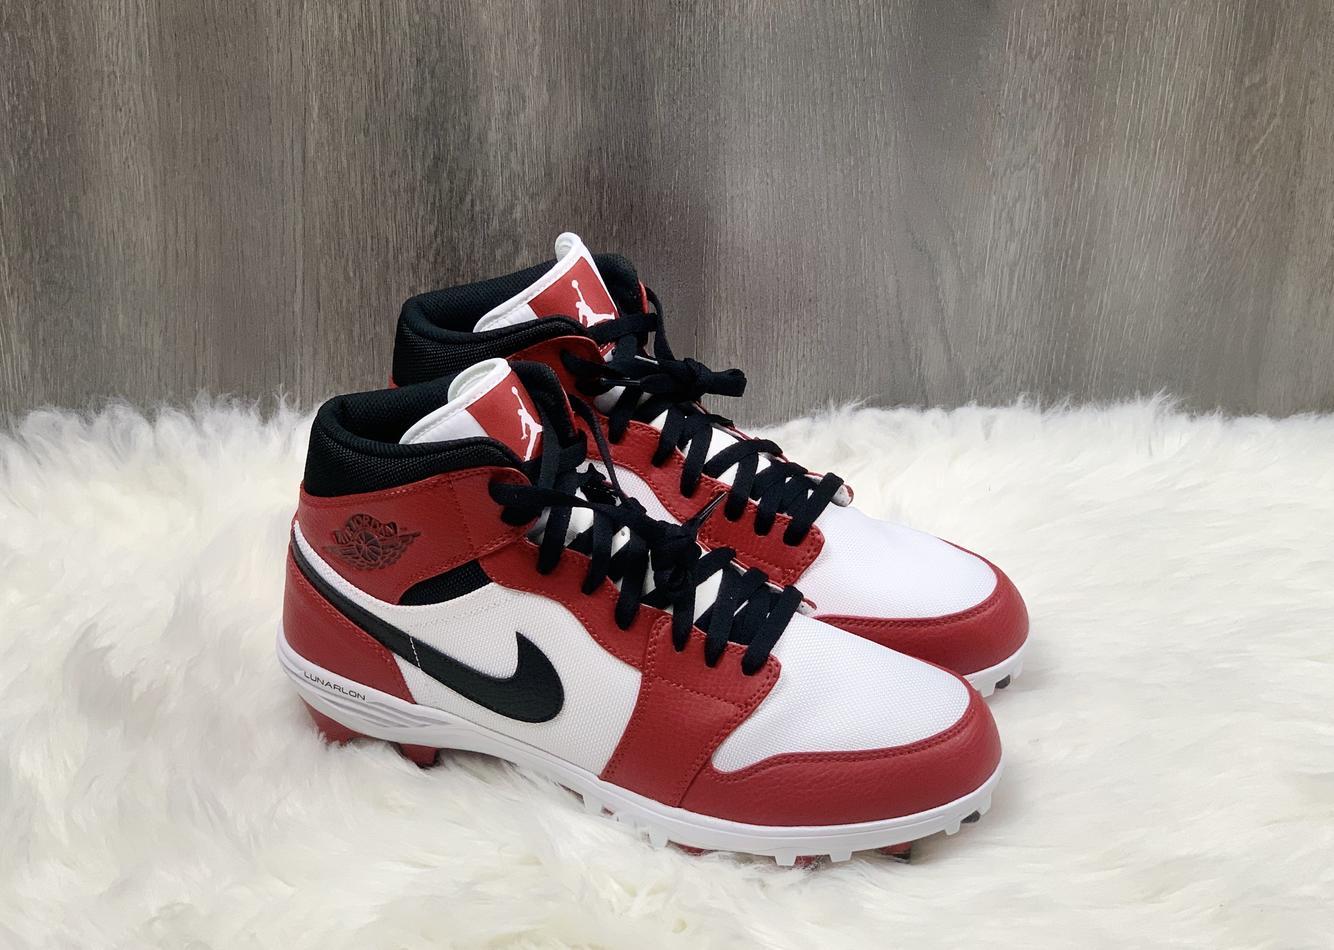 Air Jordan Nike 1 Td Sz 11 Mid Chicago Red Shoes Ar5604 106 Football Cleats